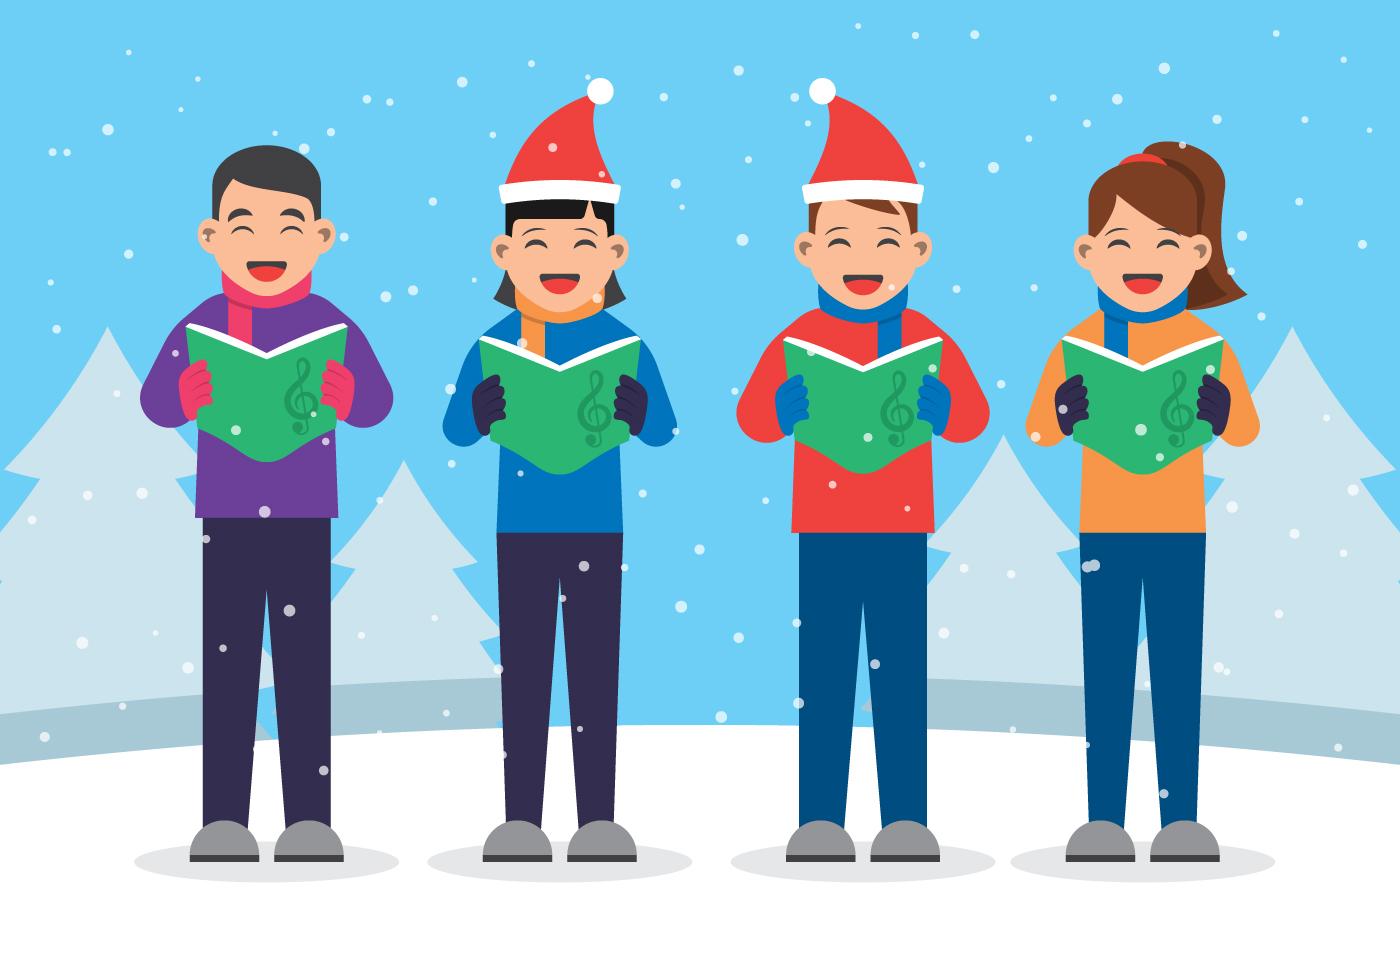 Kids Singing Christmas Carols Illustration - Download Free Vector ...